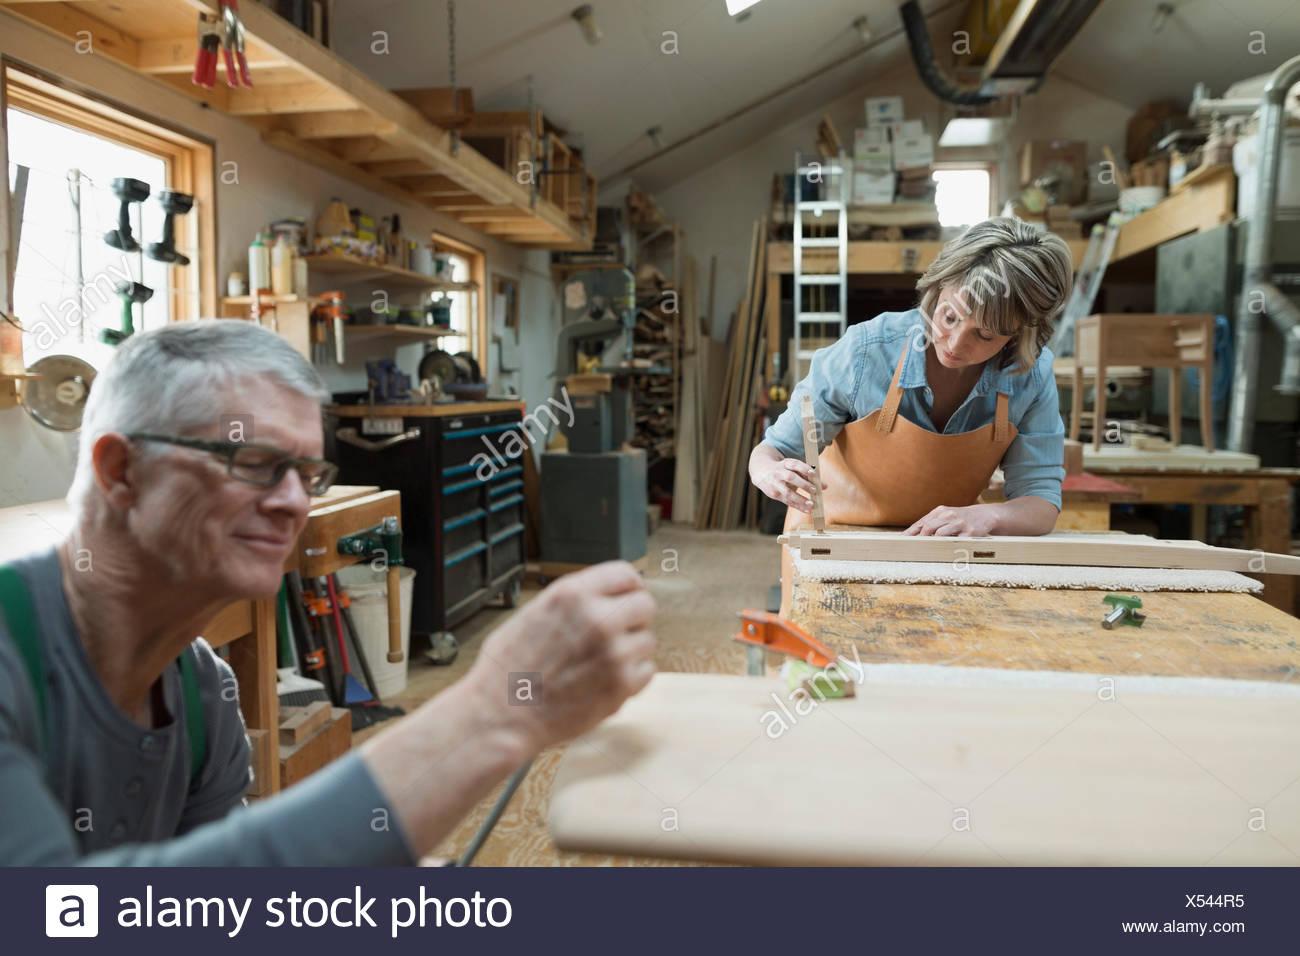 Carpenters working in workshop - Stock Image